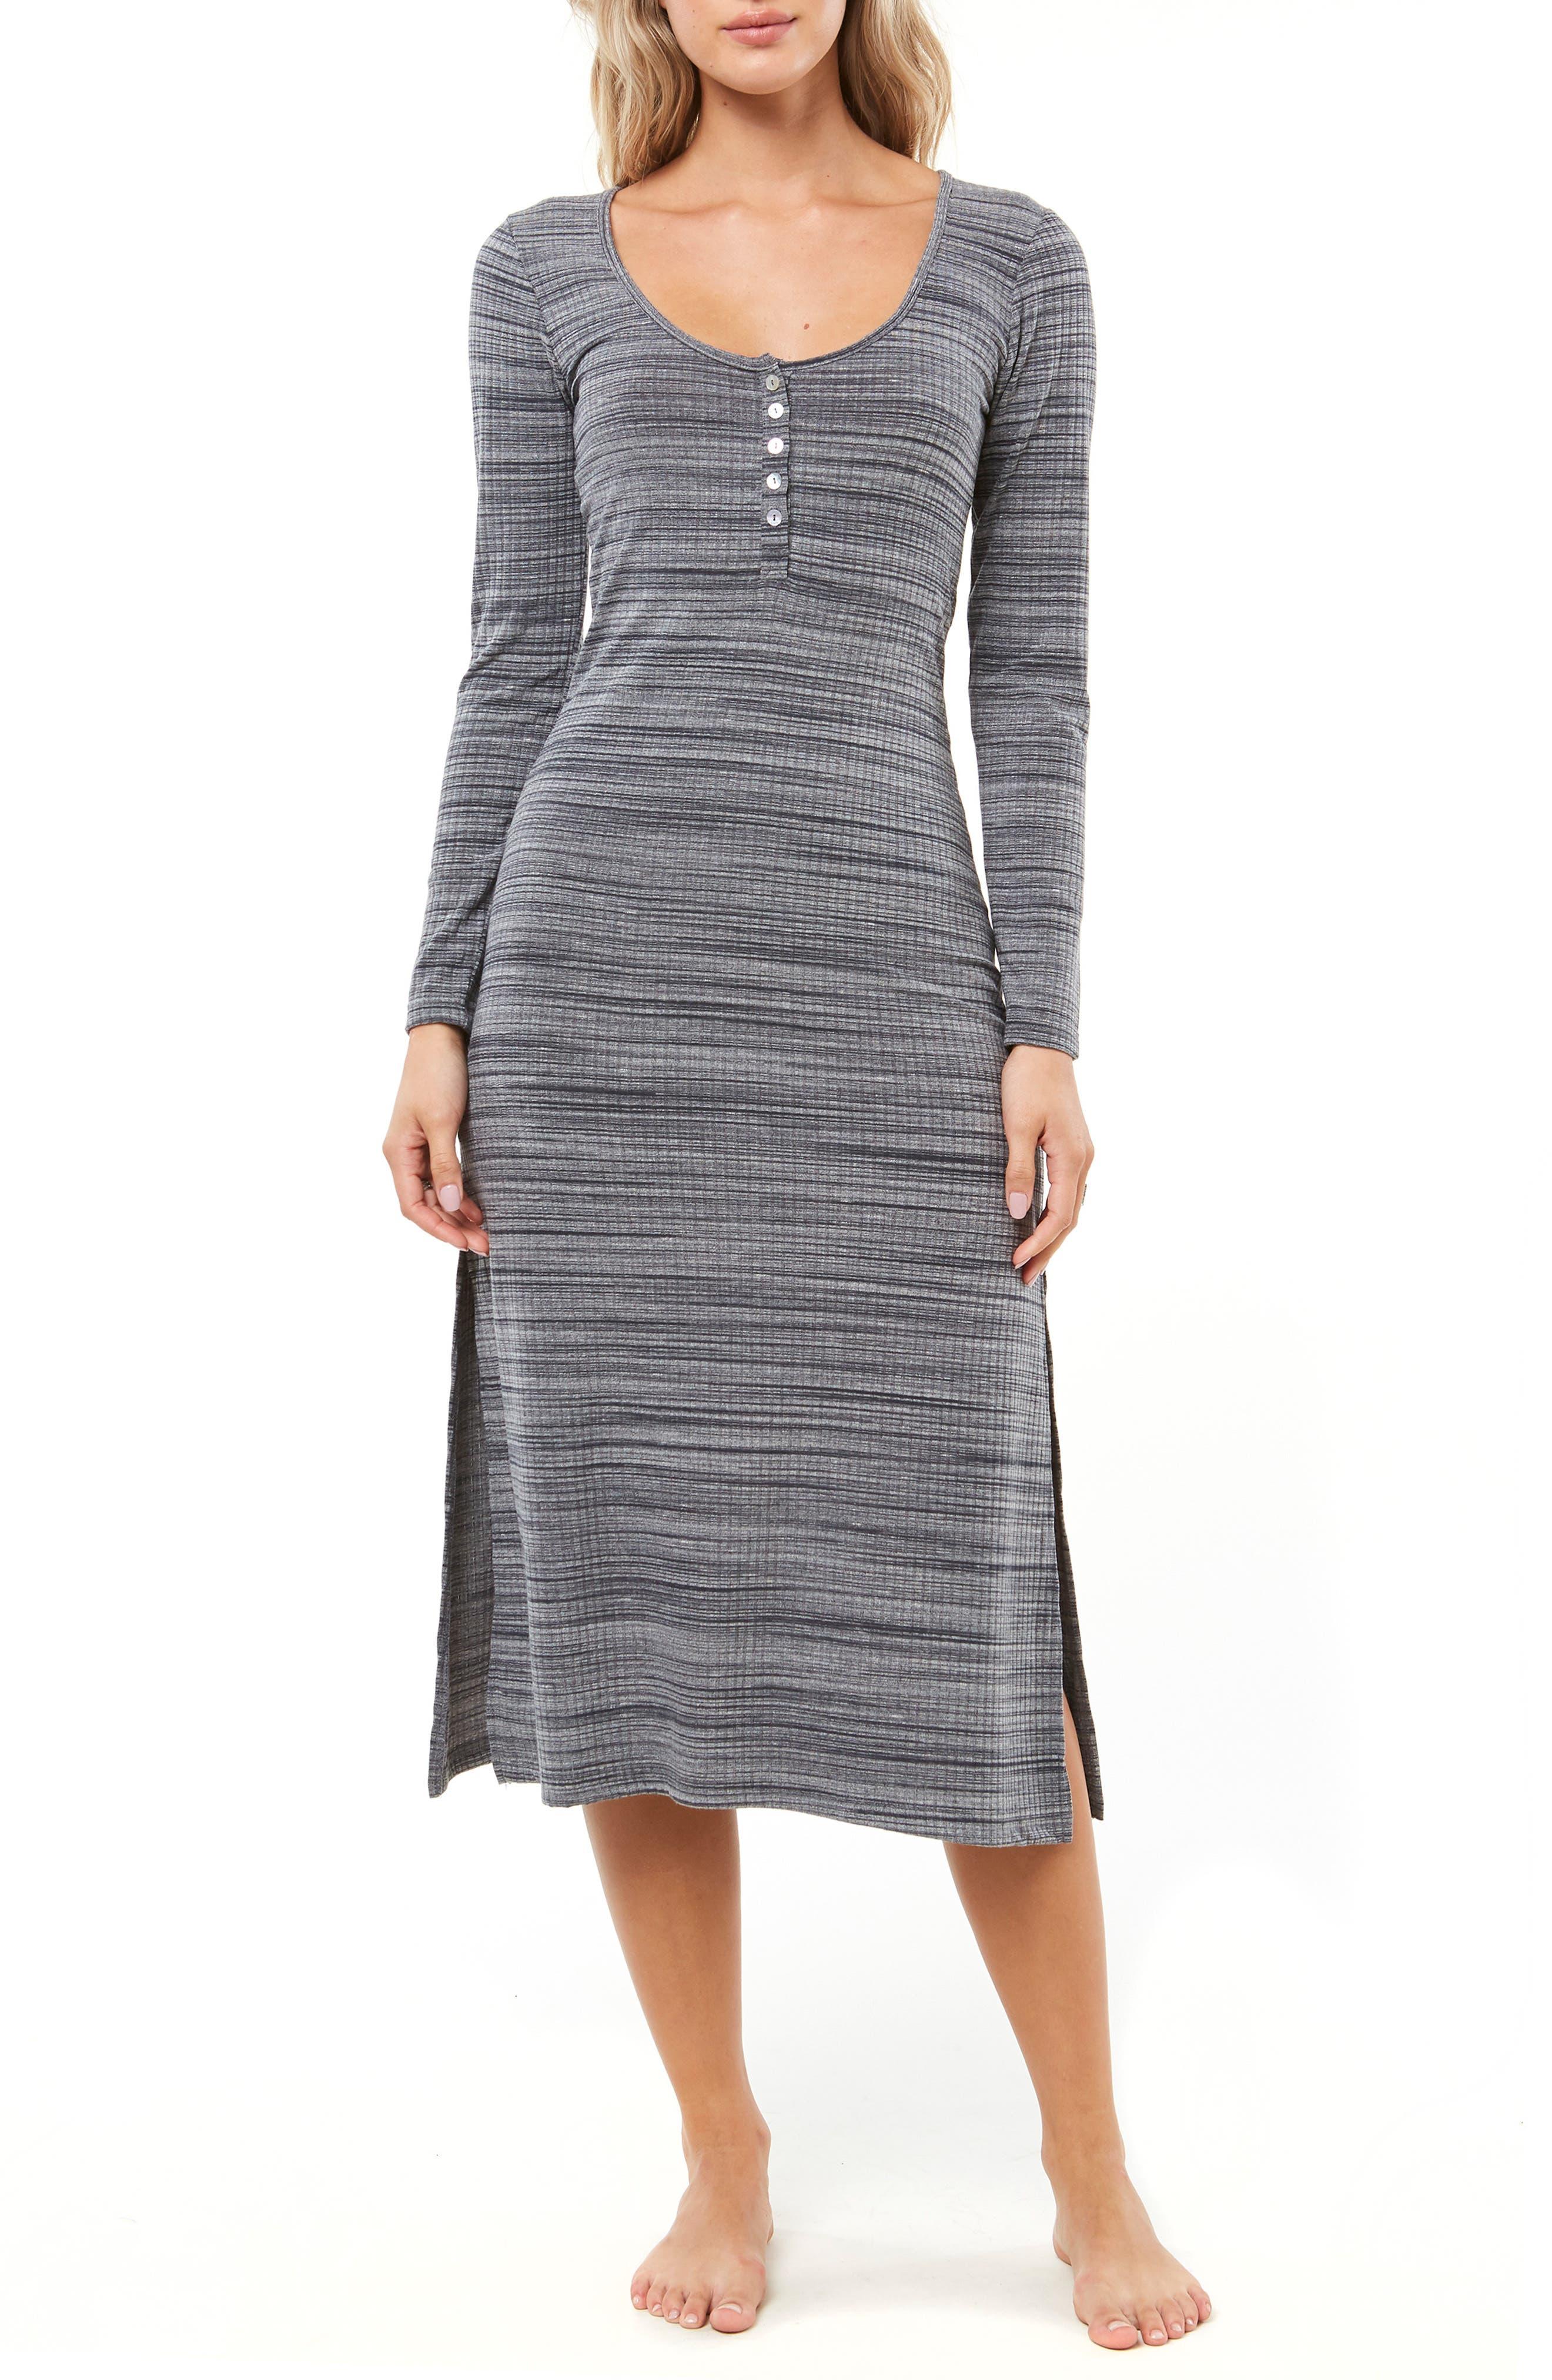 Shellsea Knit Midi Dress,                         Main,                         color, INDIAN TEAL